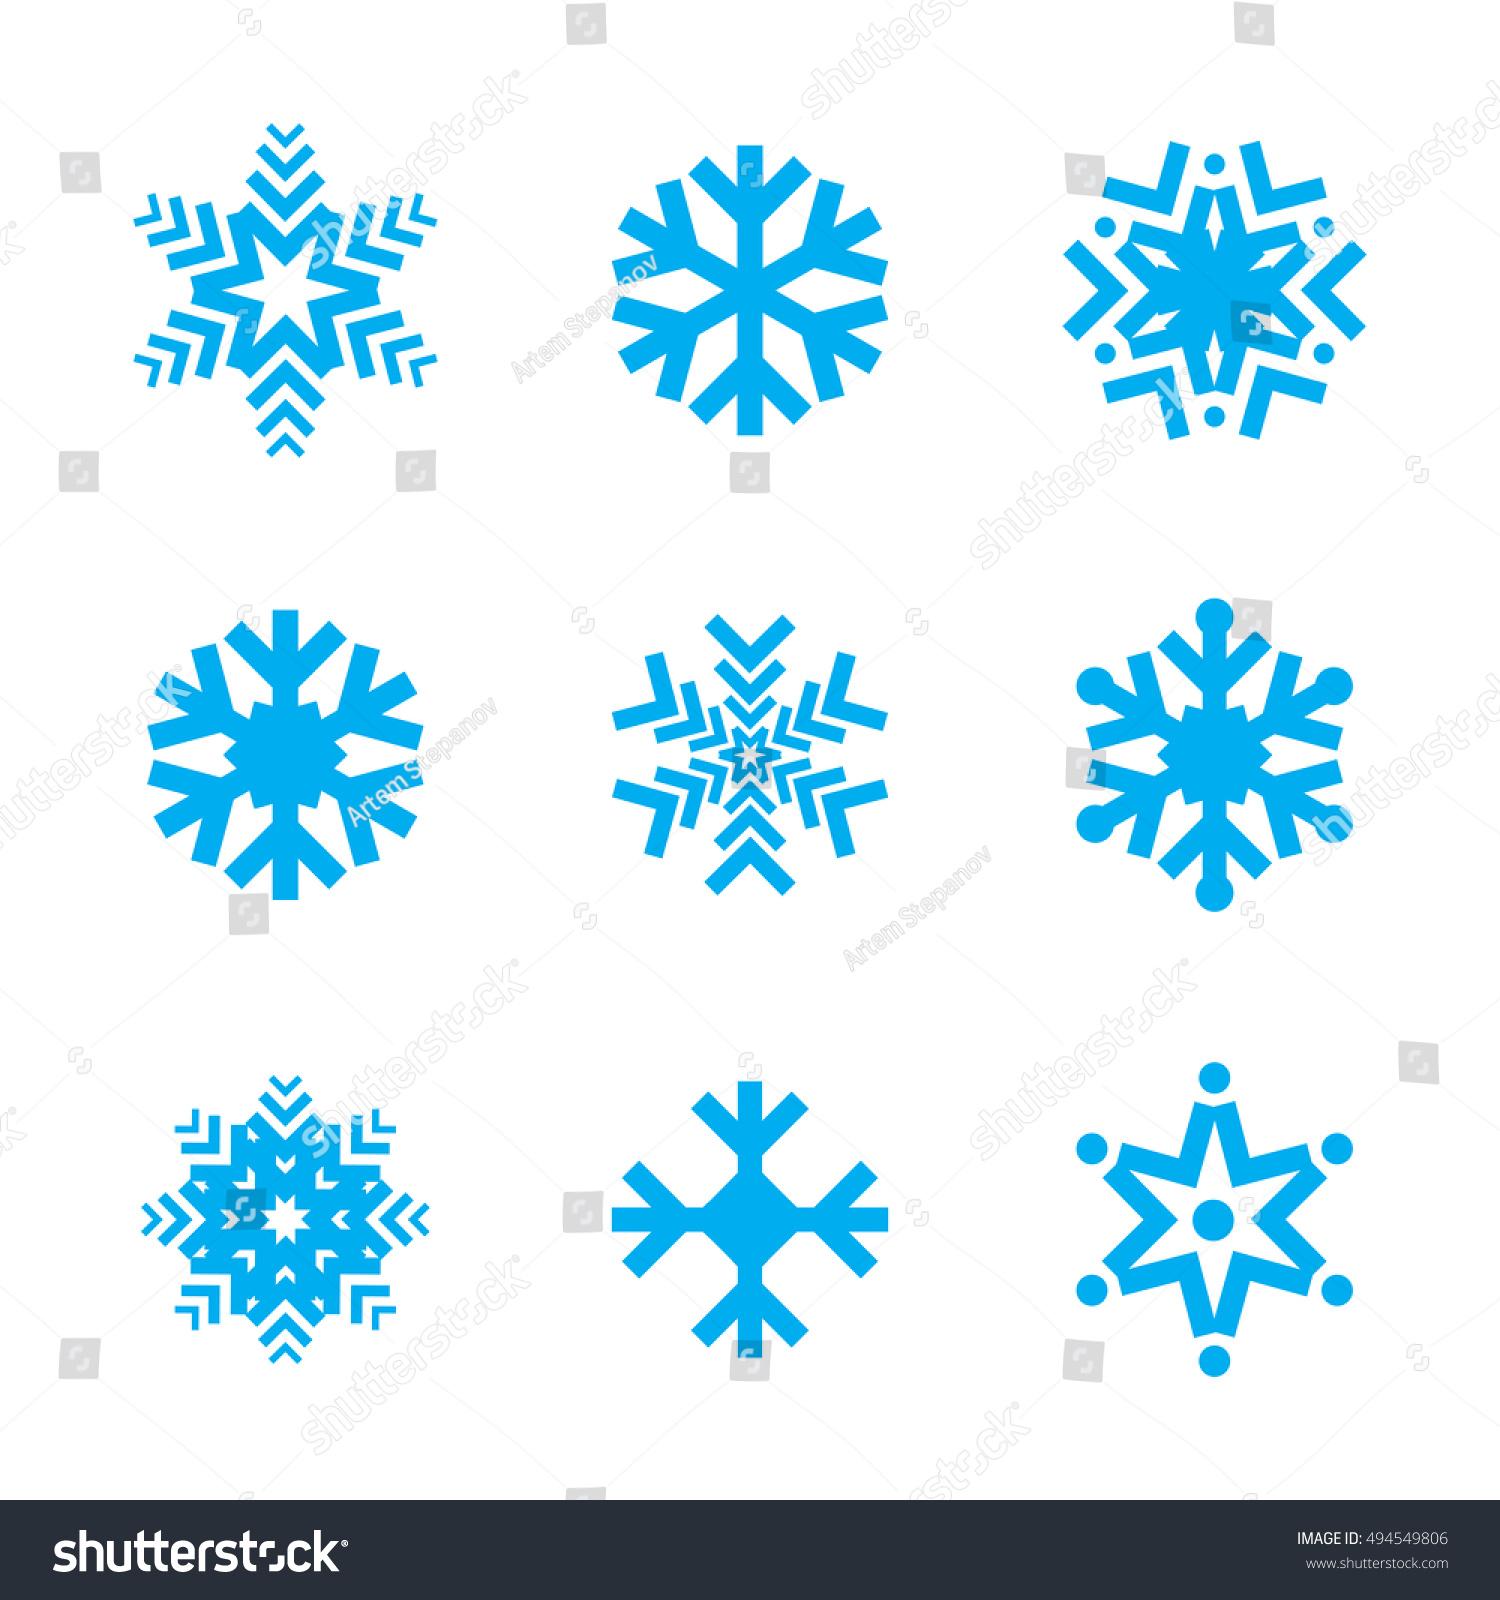 blue snow flake winter vector icon のベクター画像素材 ロイヤリティ